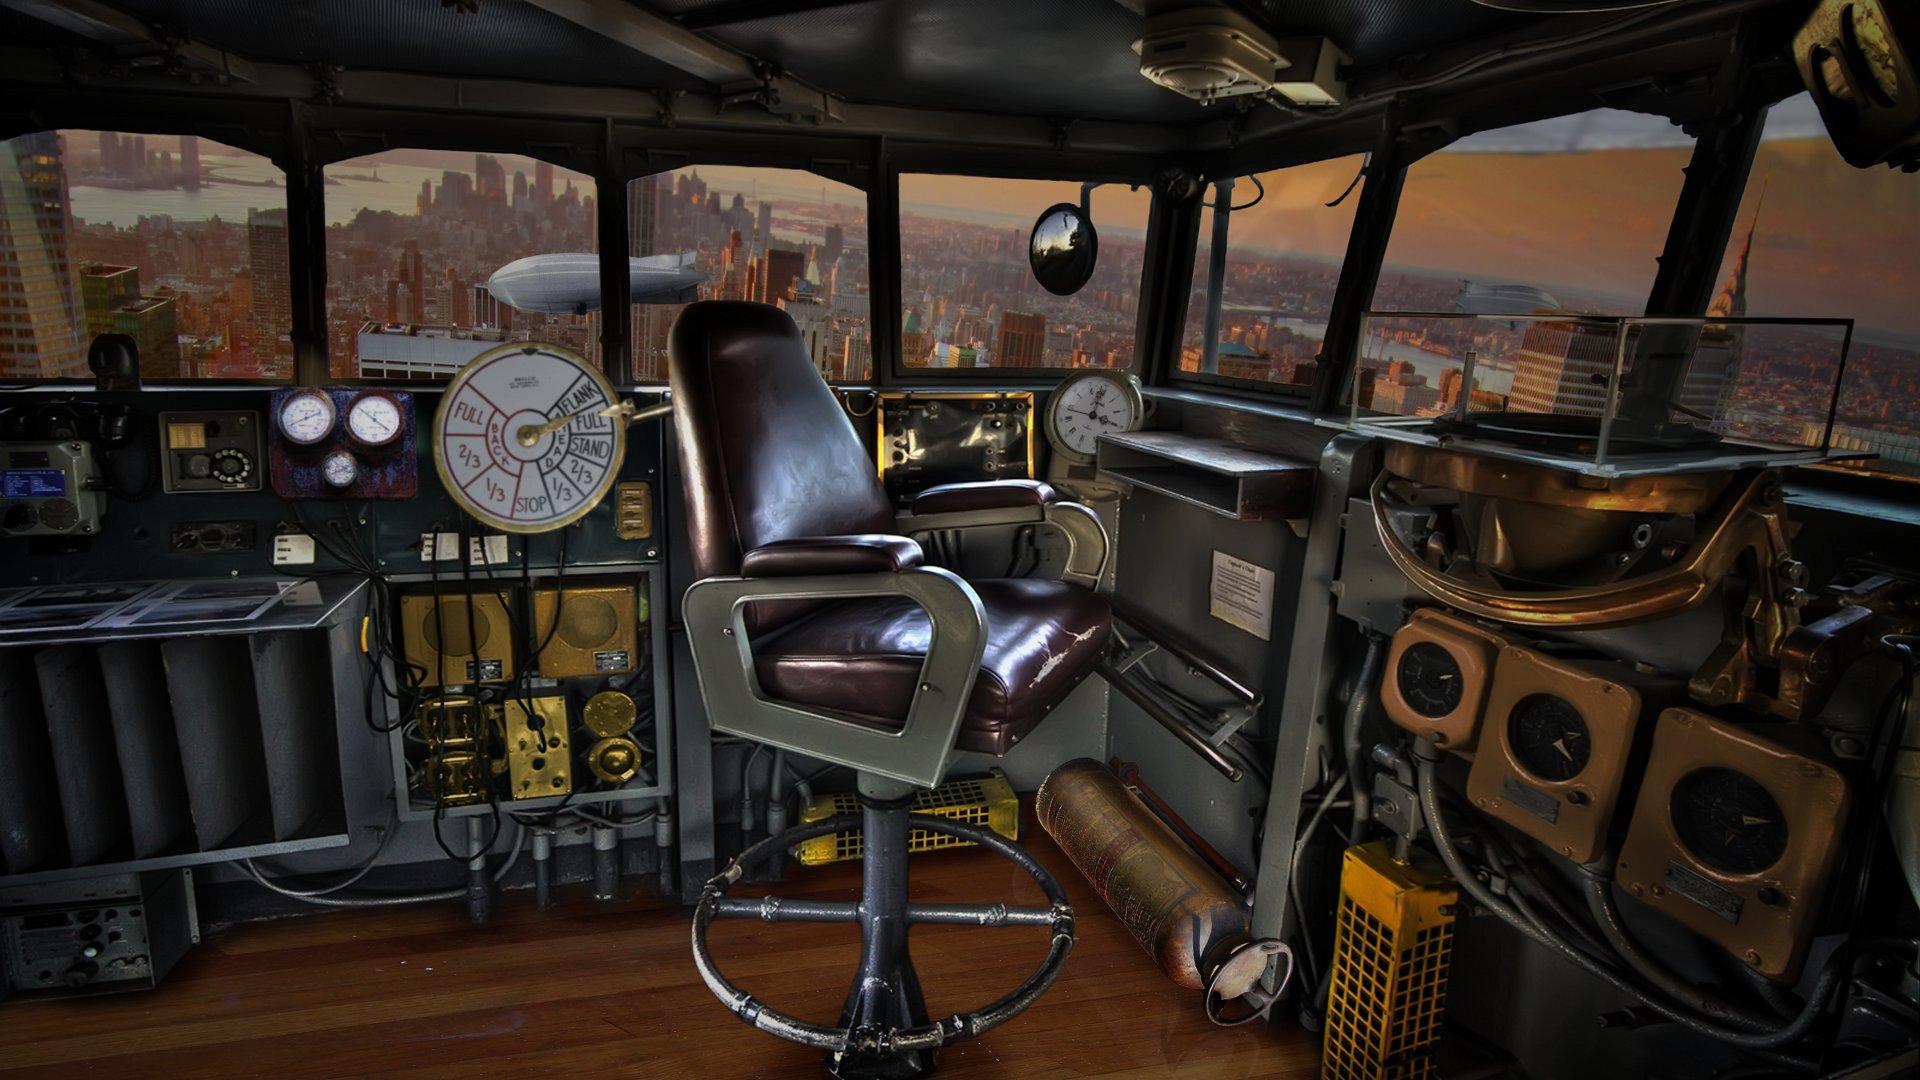 Airship Cabin 1920x1080 by syntaxerroronlinenul